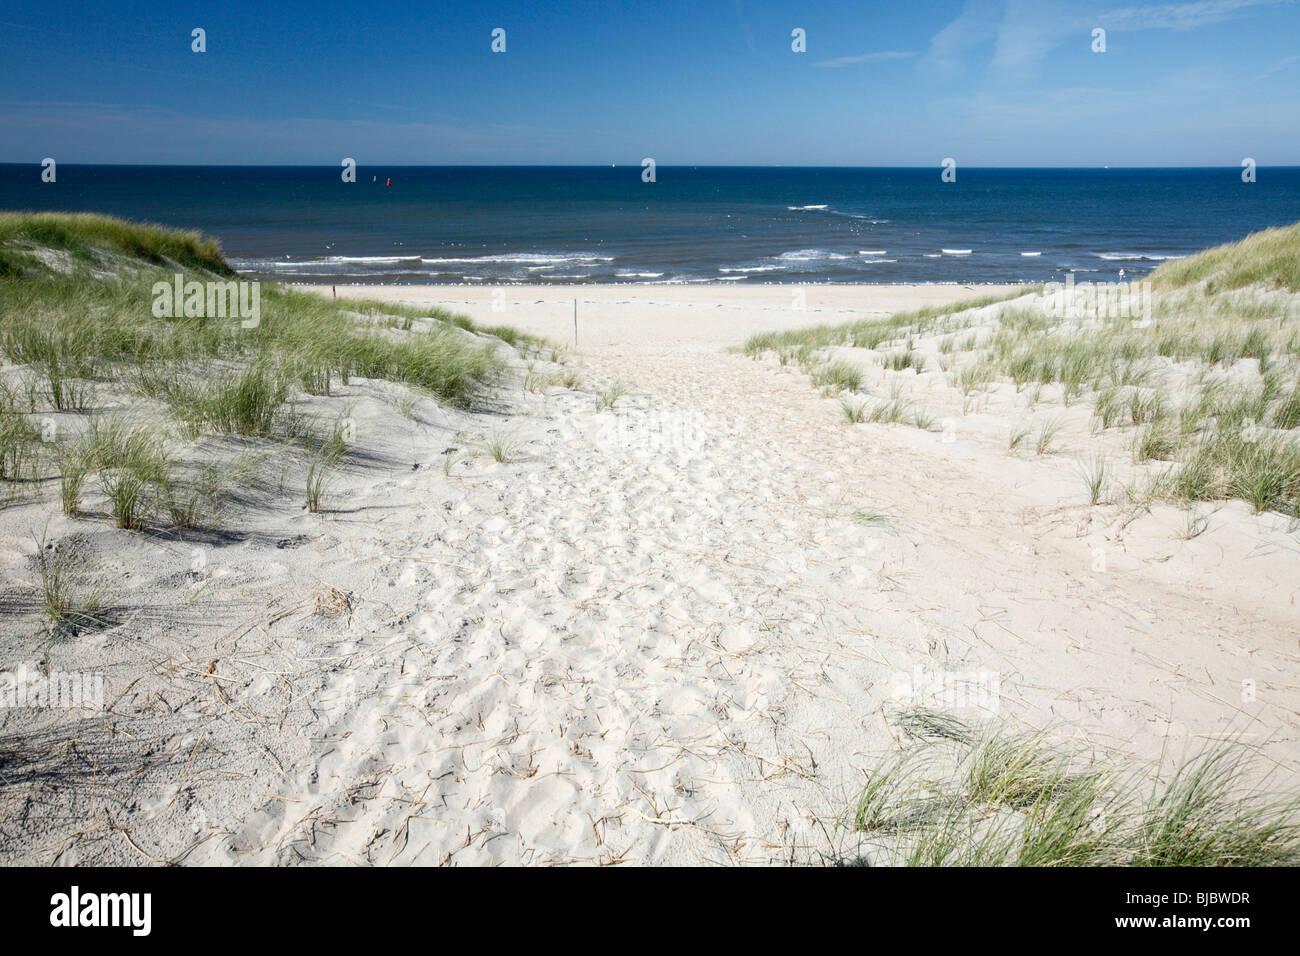 North Sea, beach and sand dunes, Texel Island, Holland - Stock Image